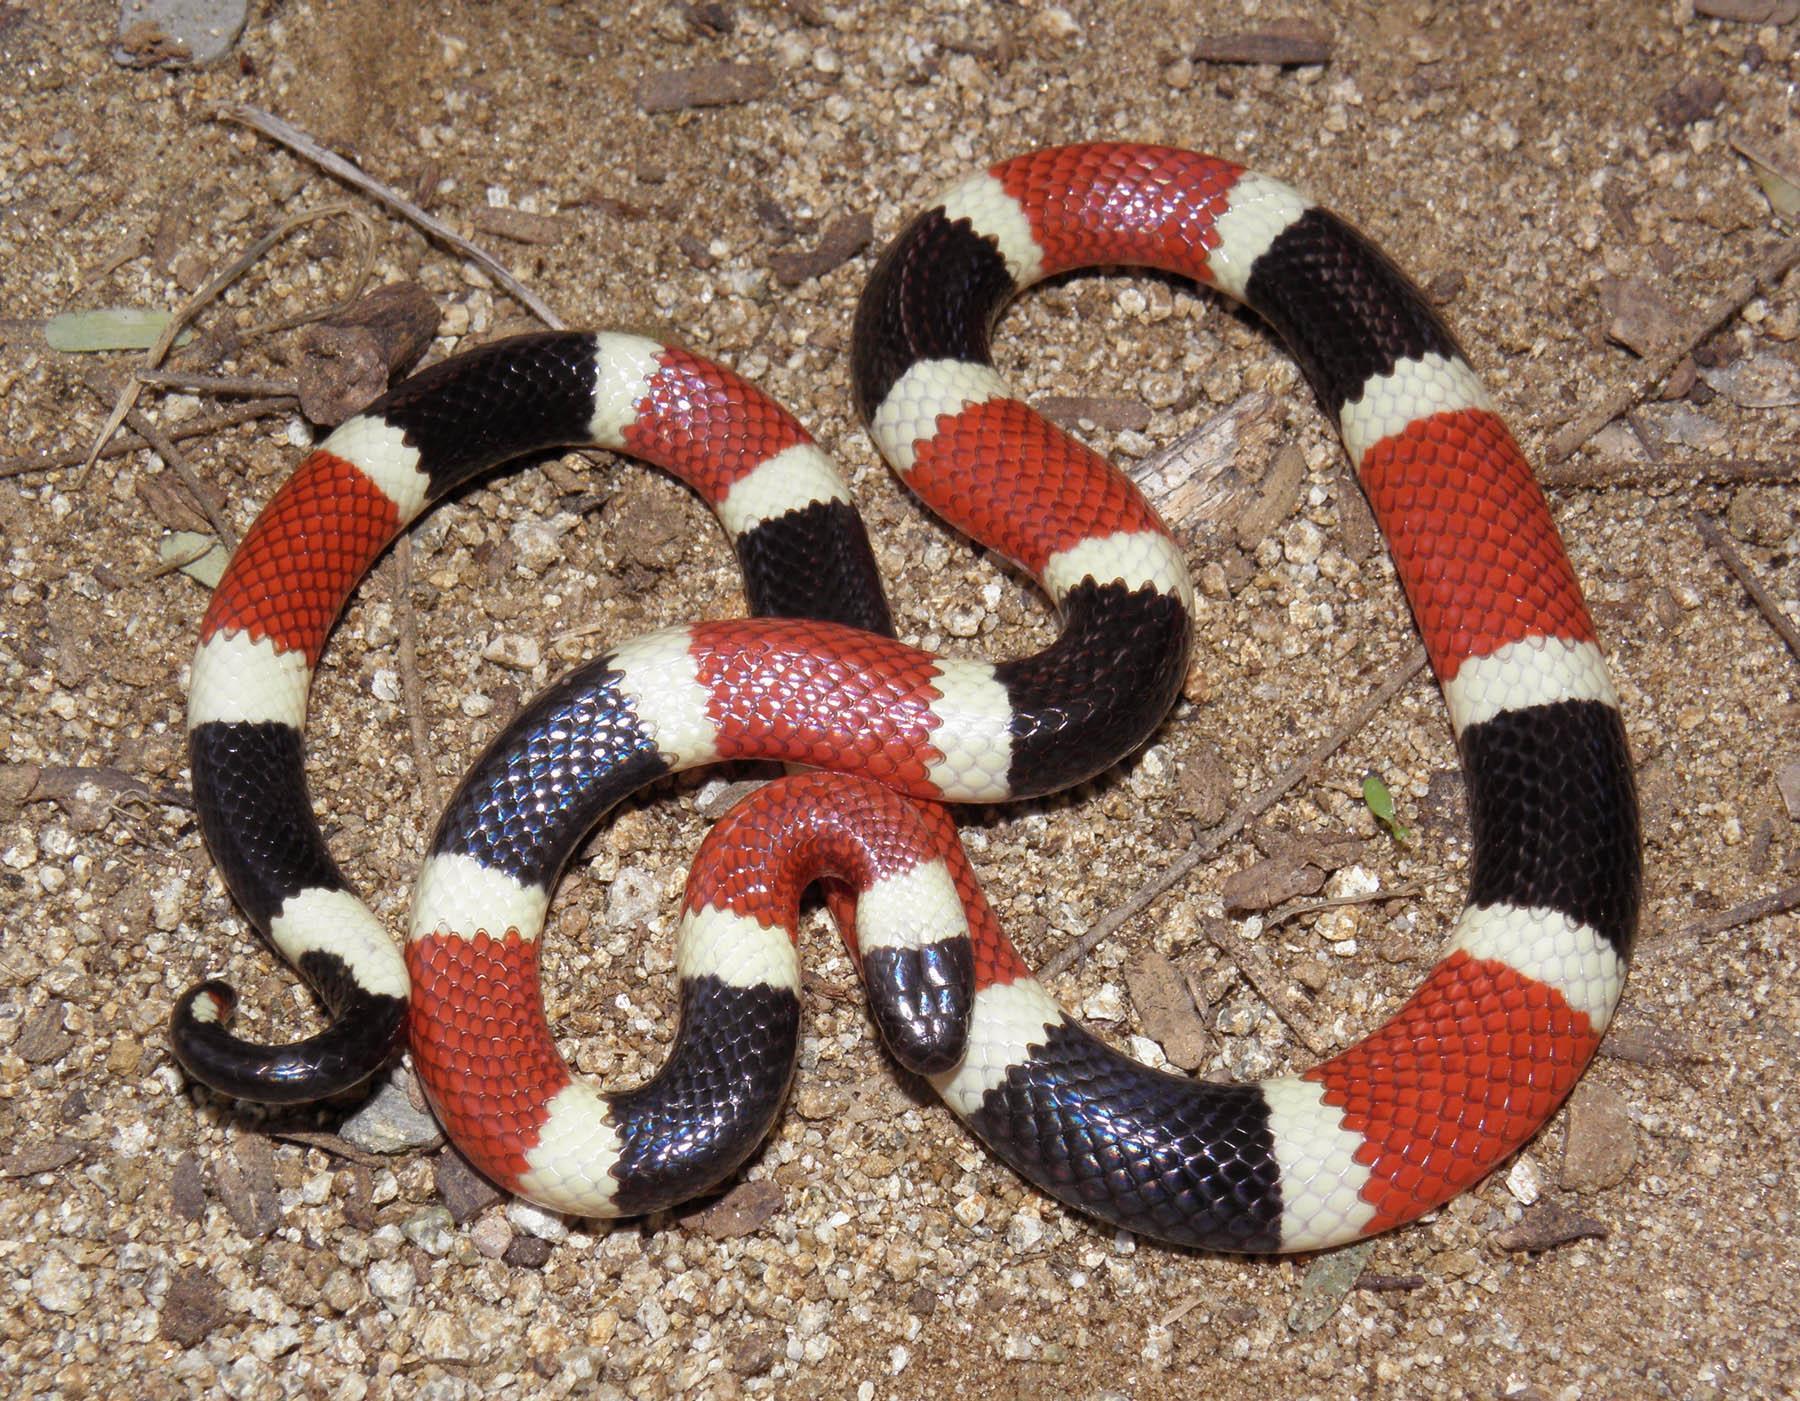 Drawn snake coral snake Coral svg Snake #17 Coral